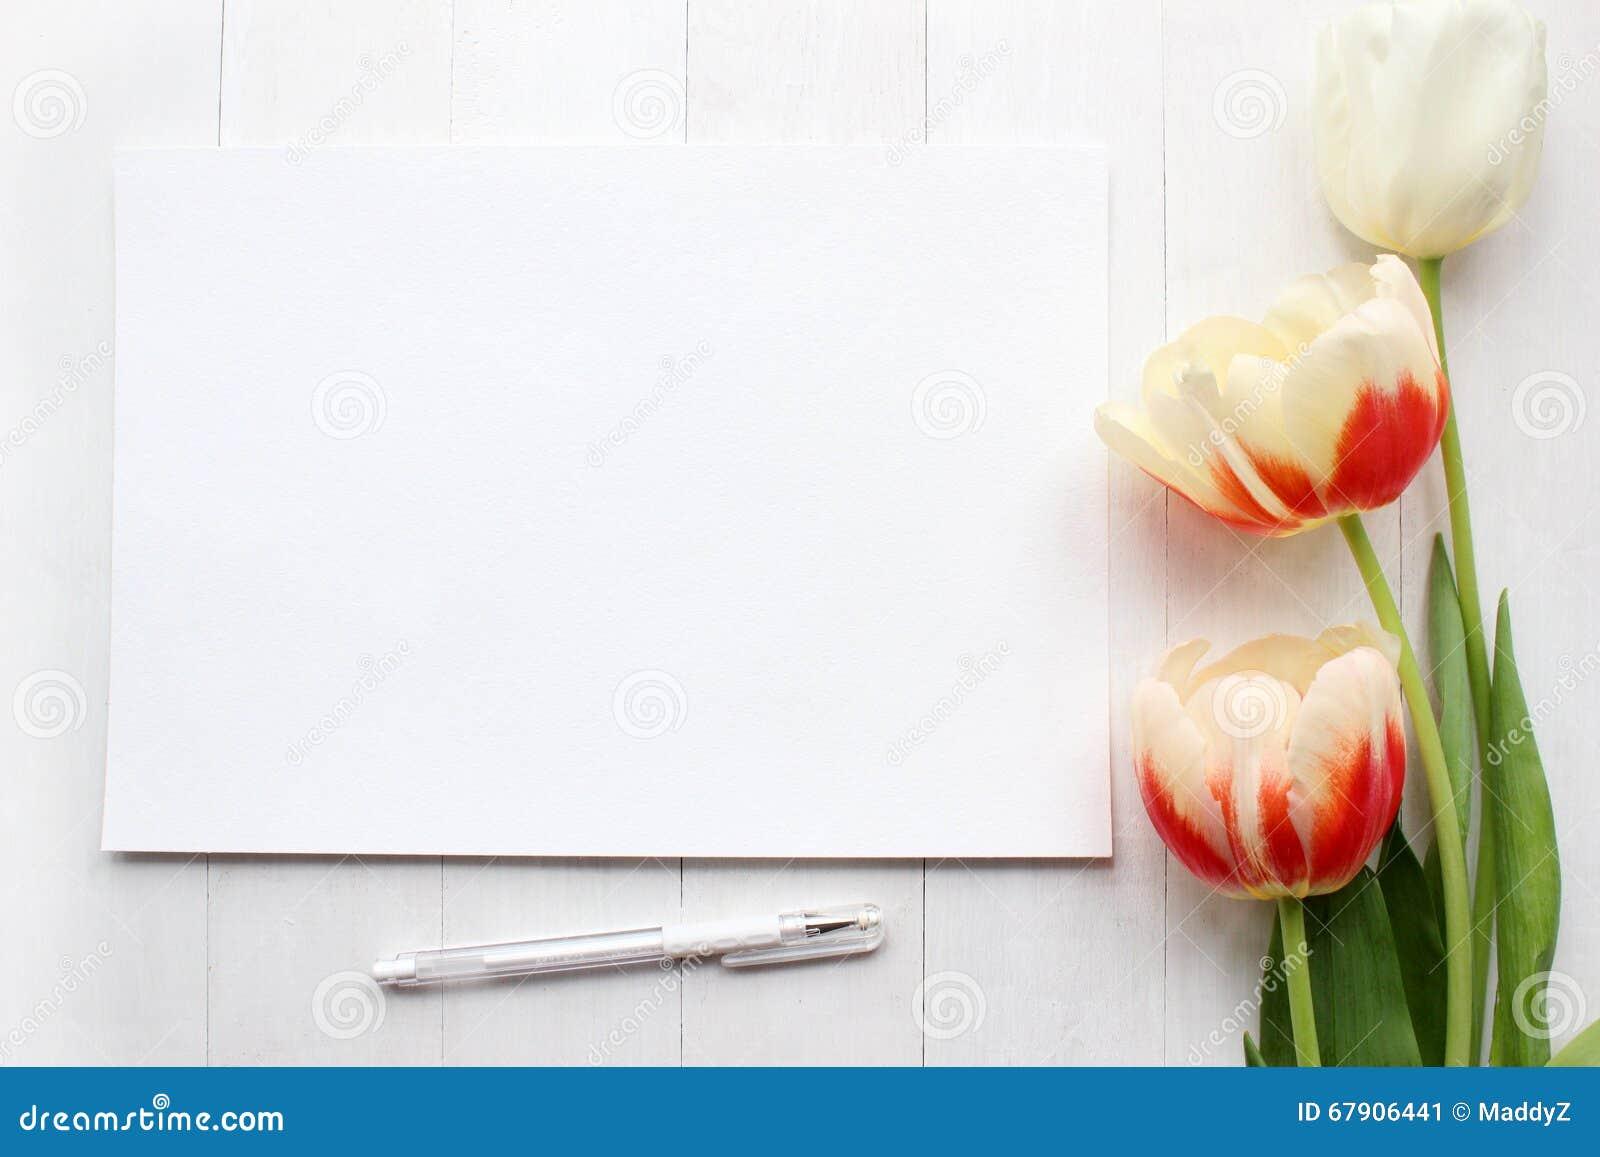 tulips mockup post blog social media stock image image of banner